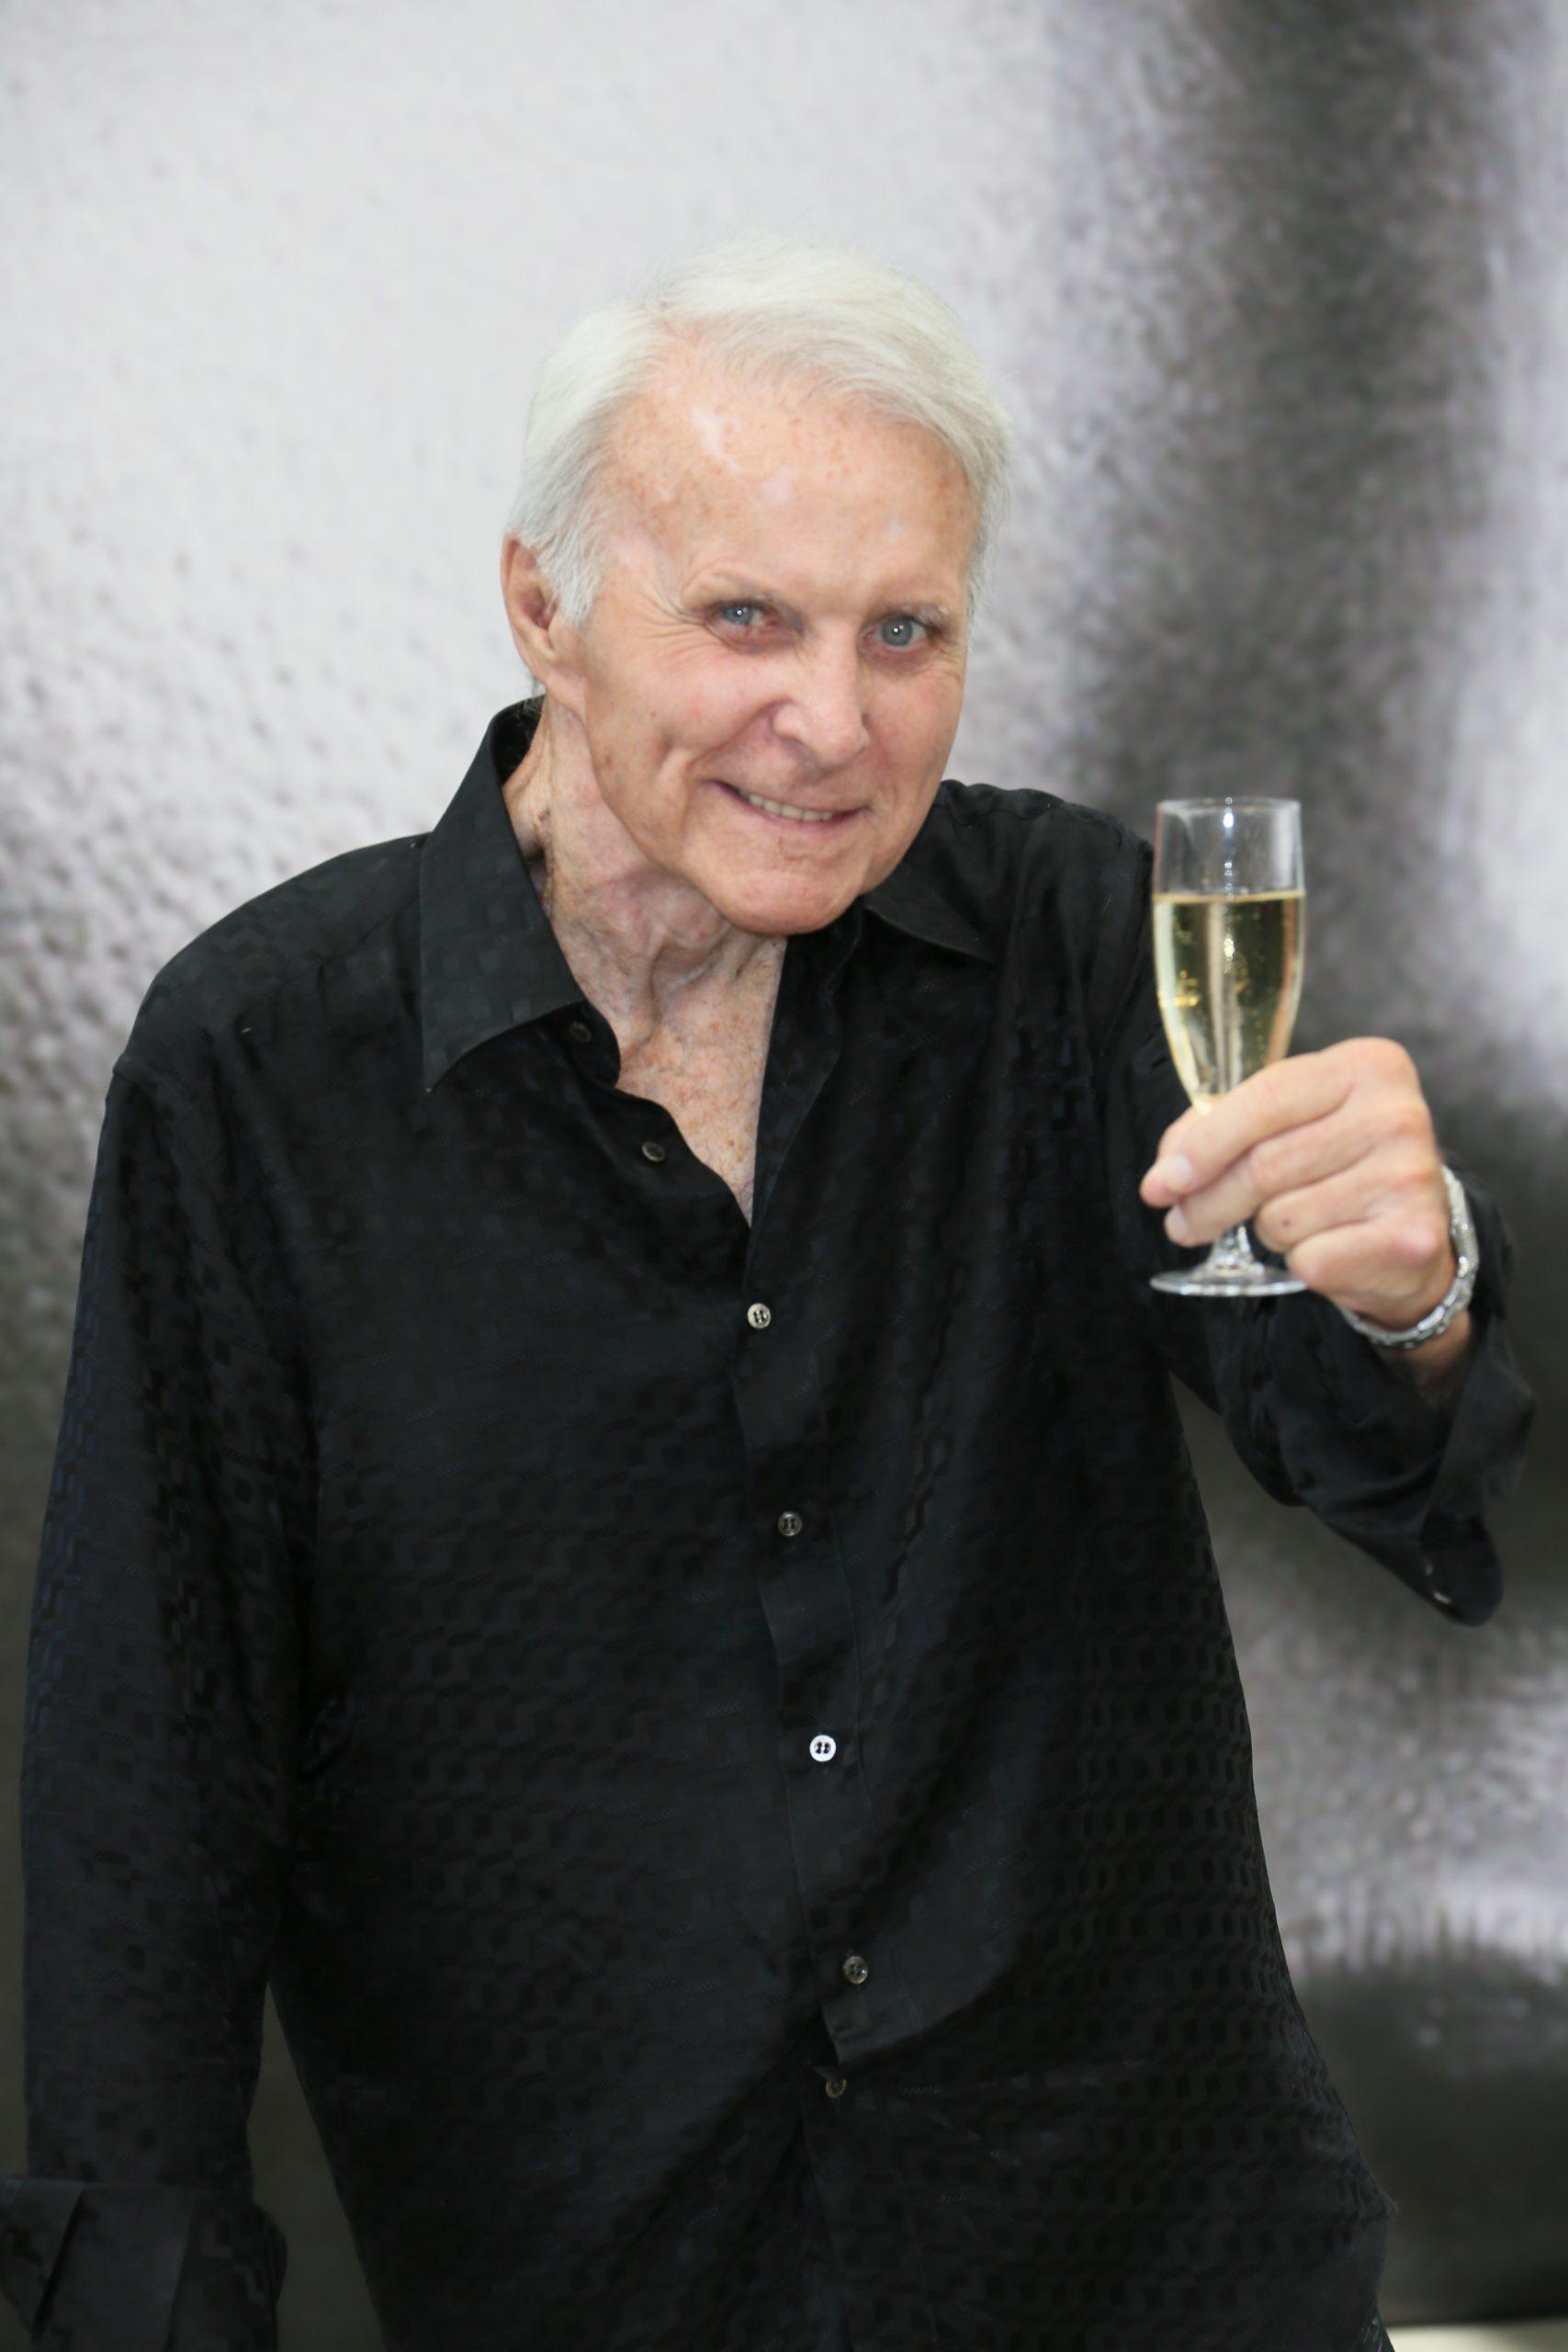 robert conrad drinking champagne